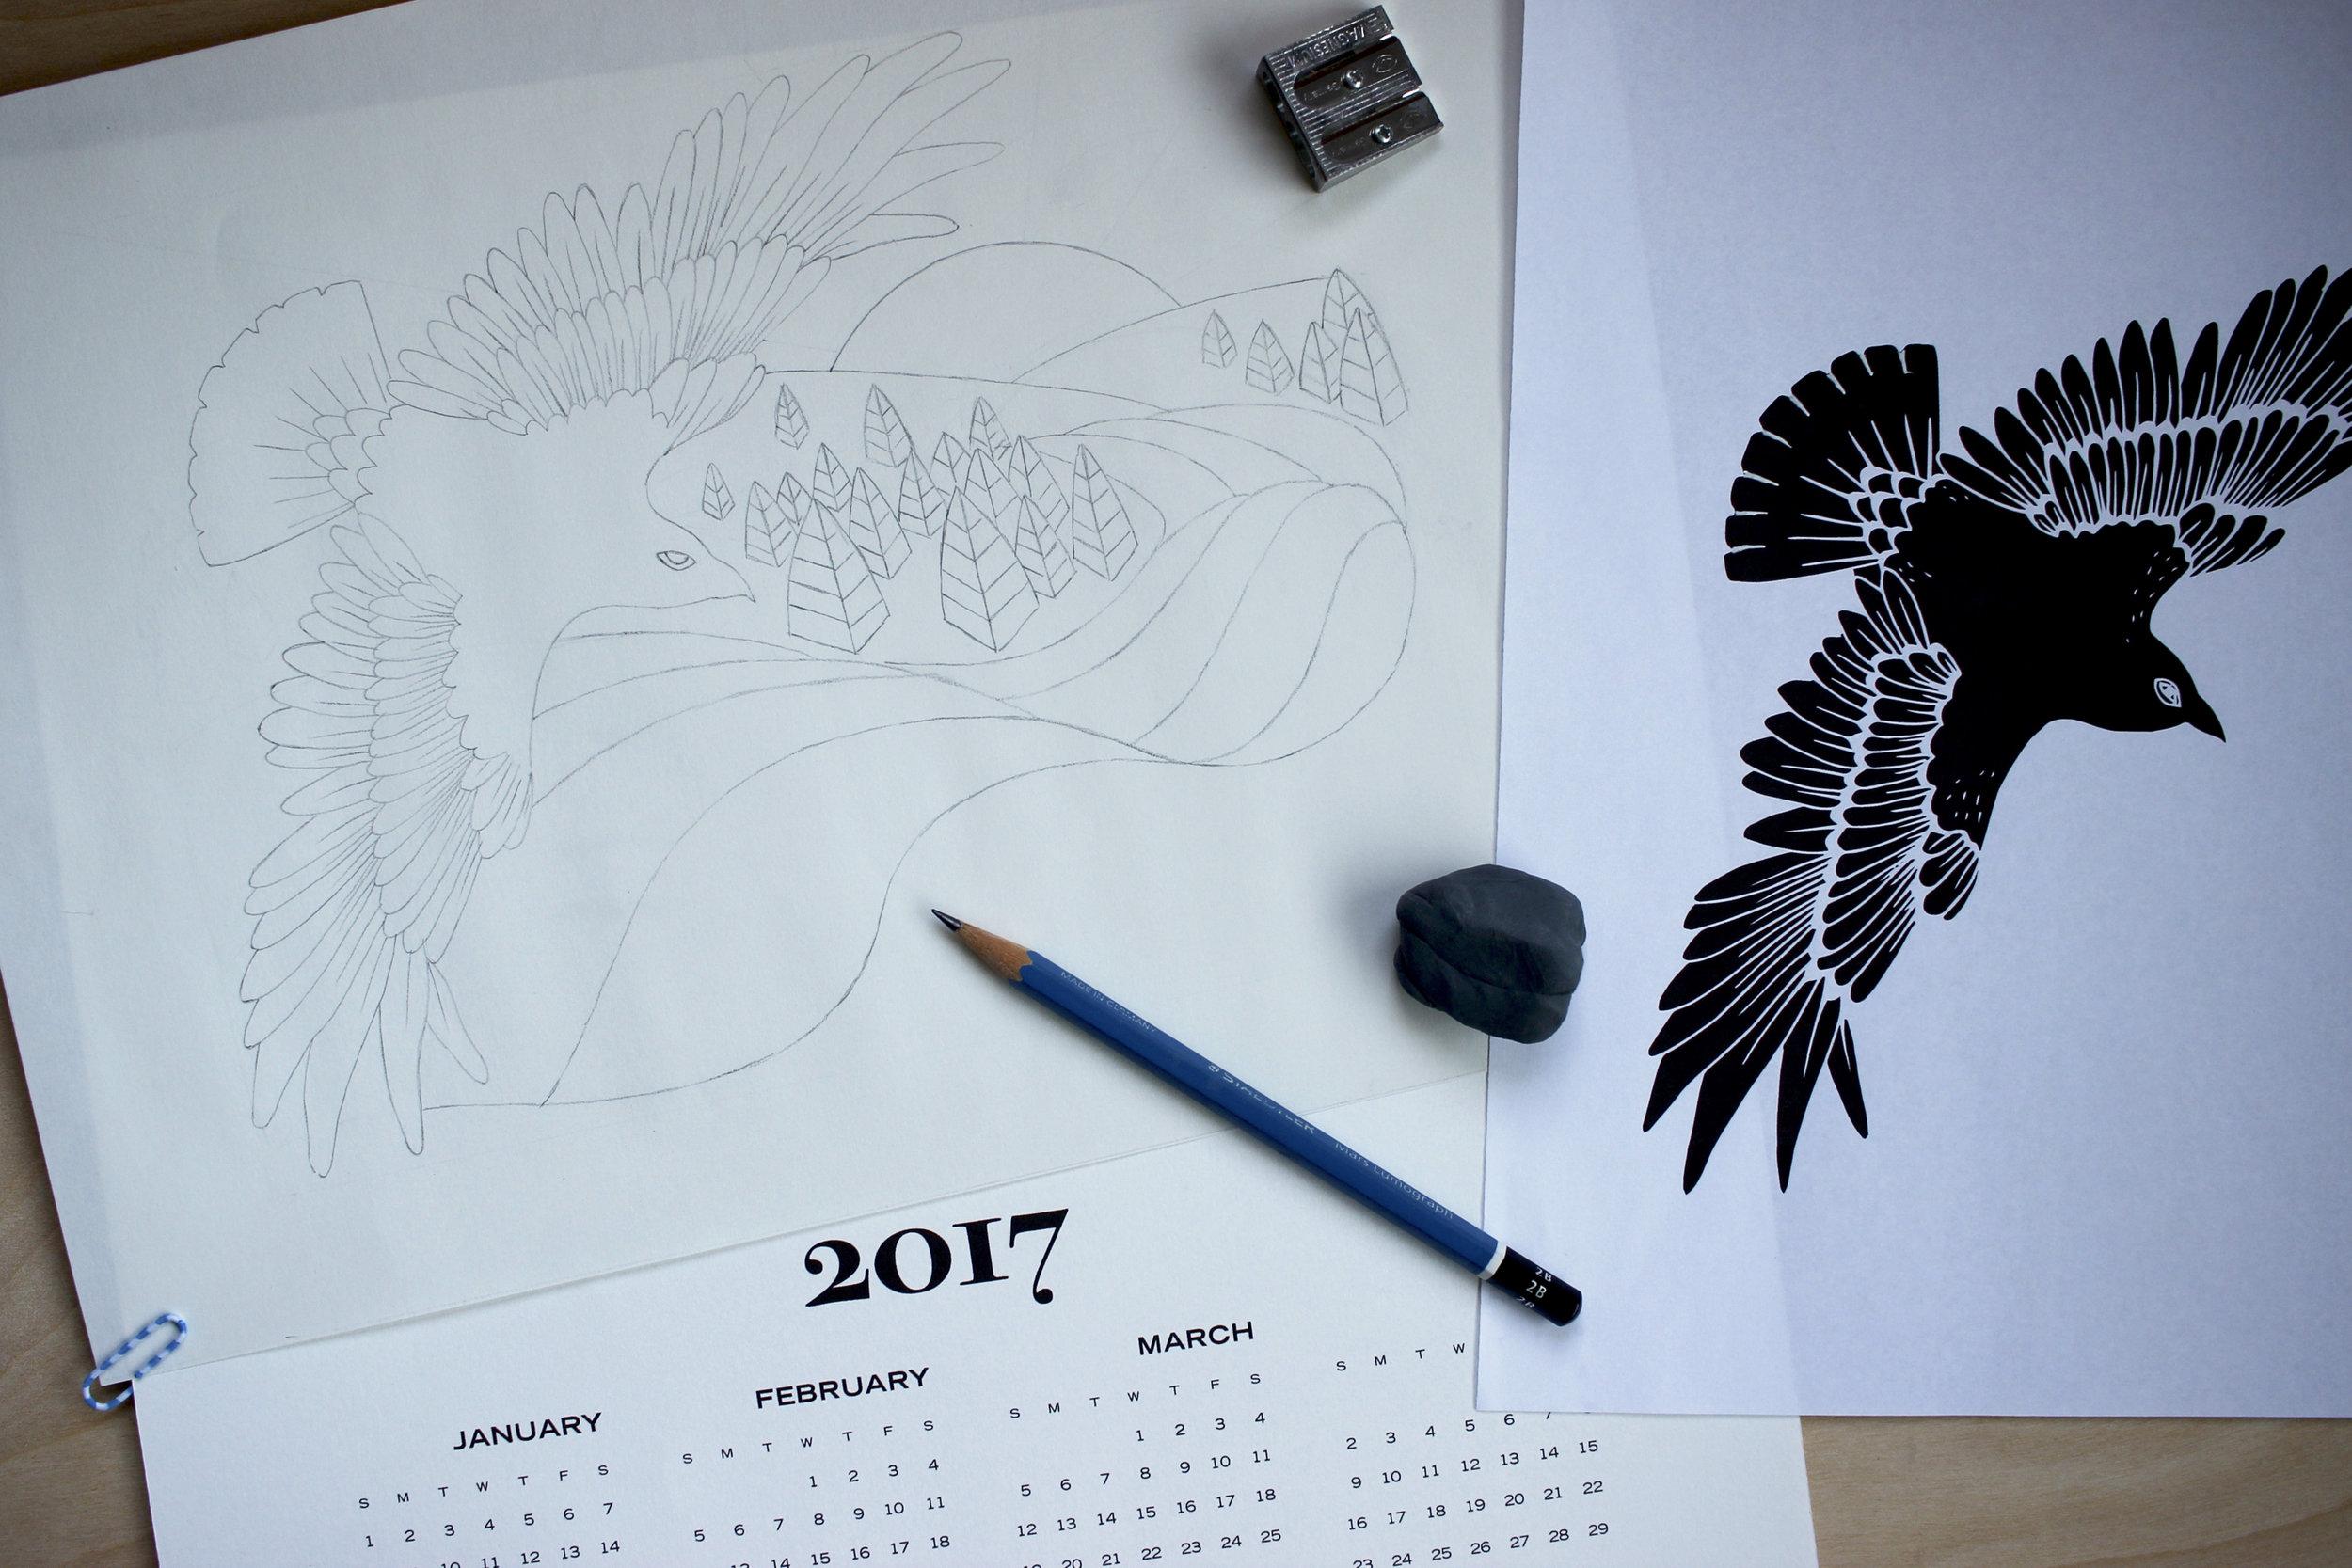 Tiger Food Press 2017 letterpress calendar sketch nearly complete